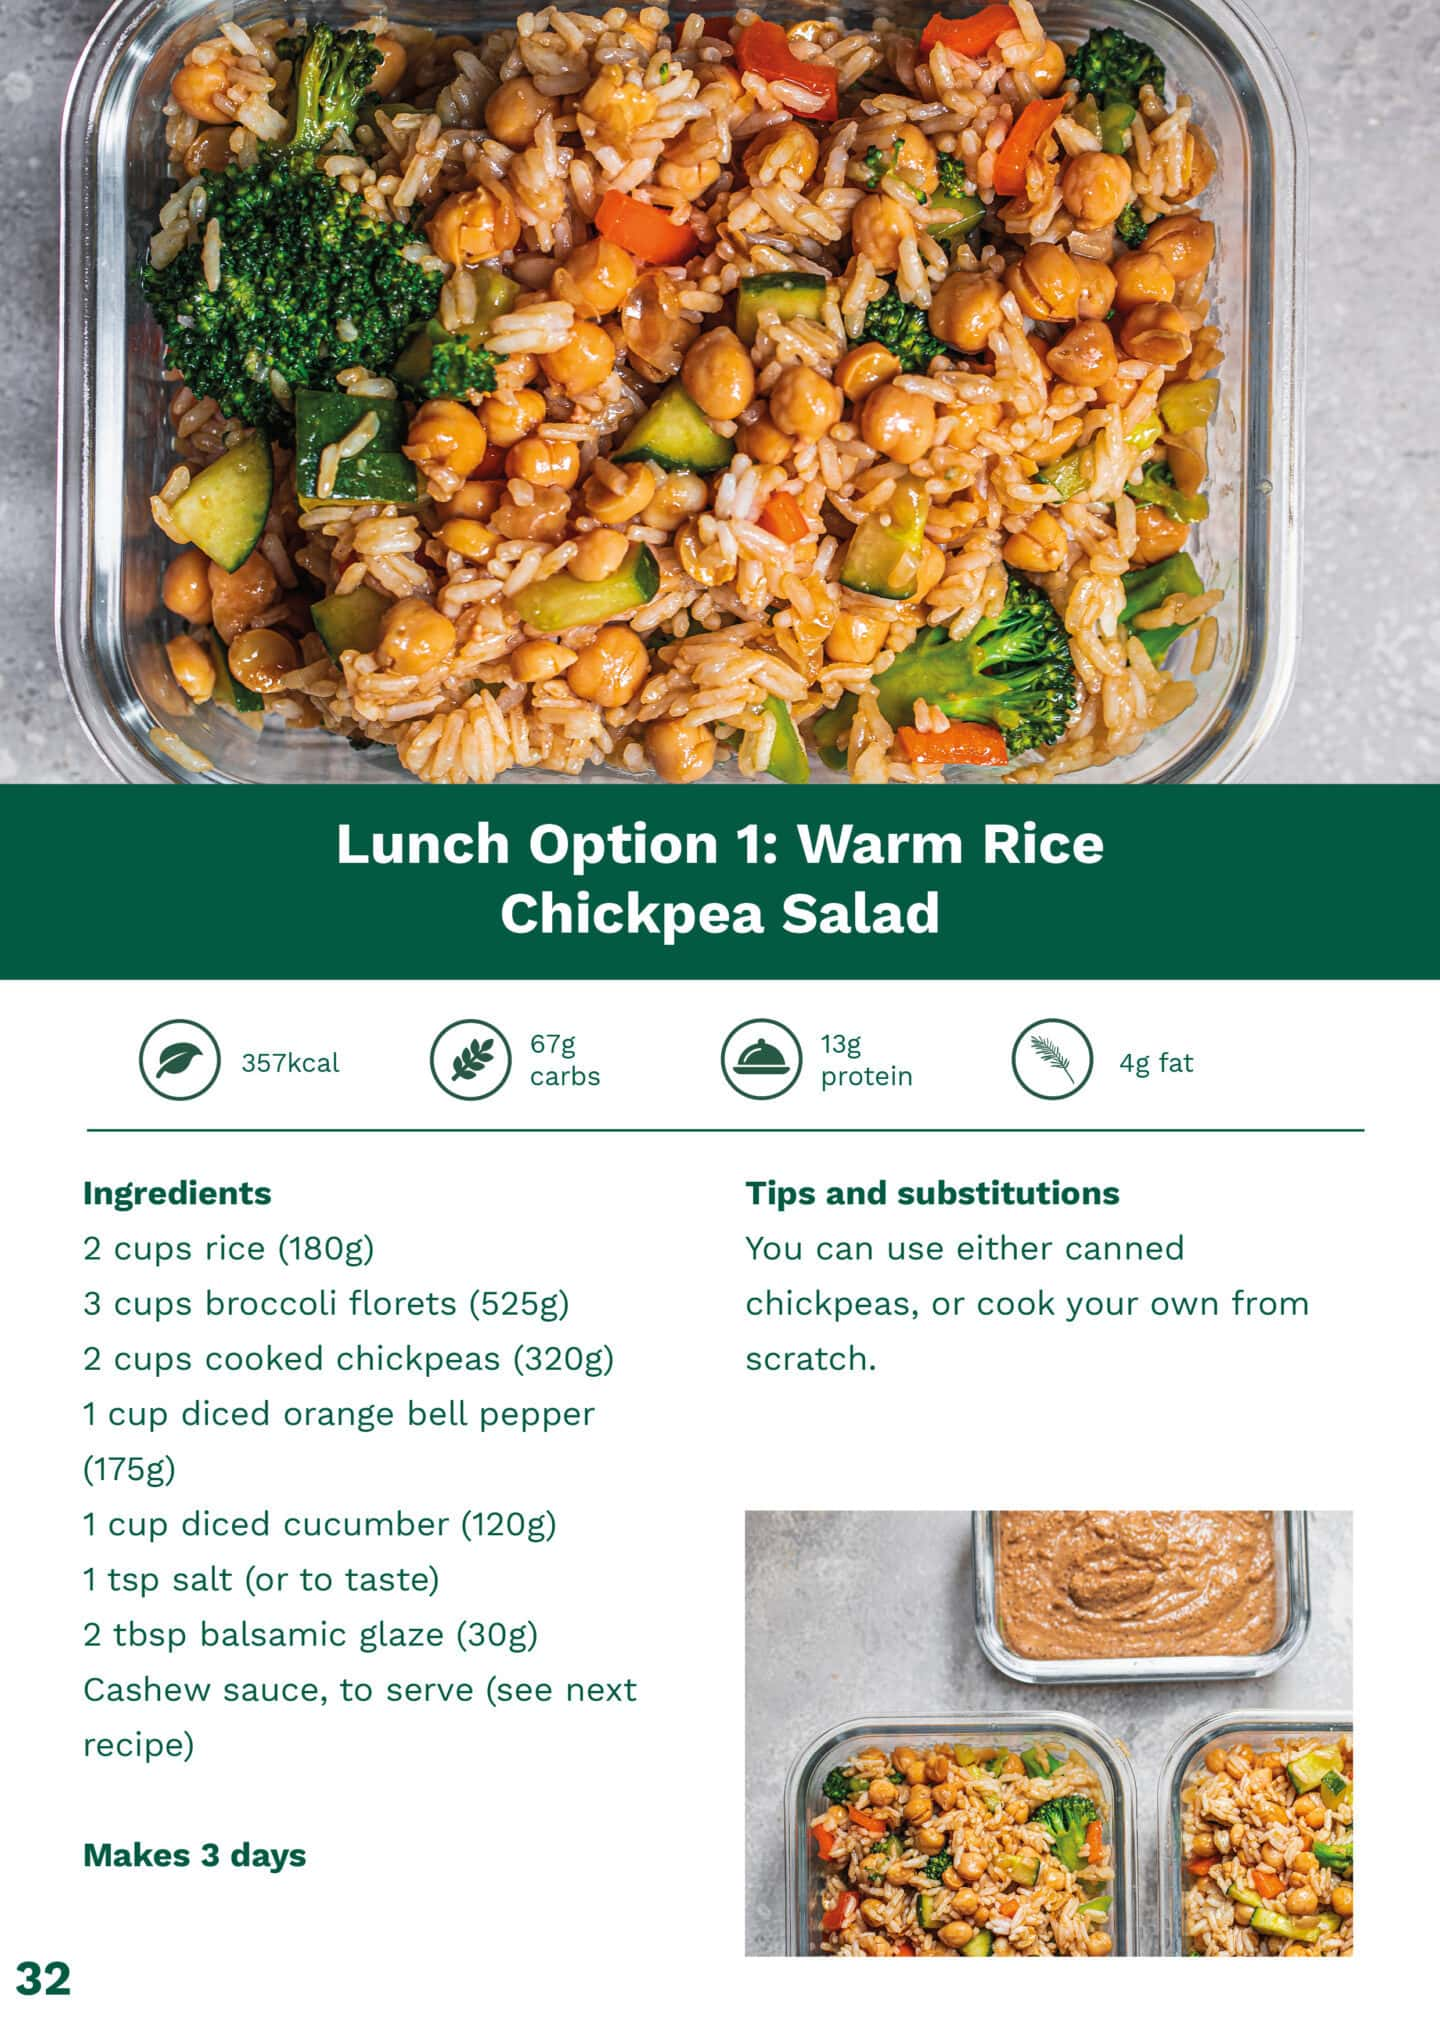 Warm rice chickpea salad